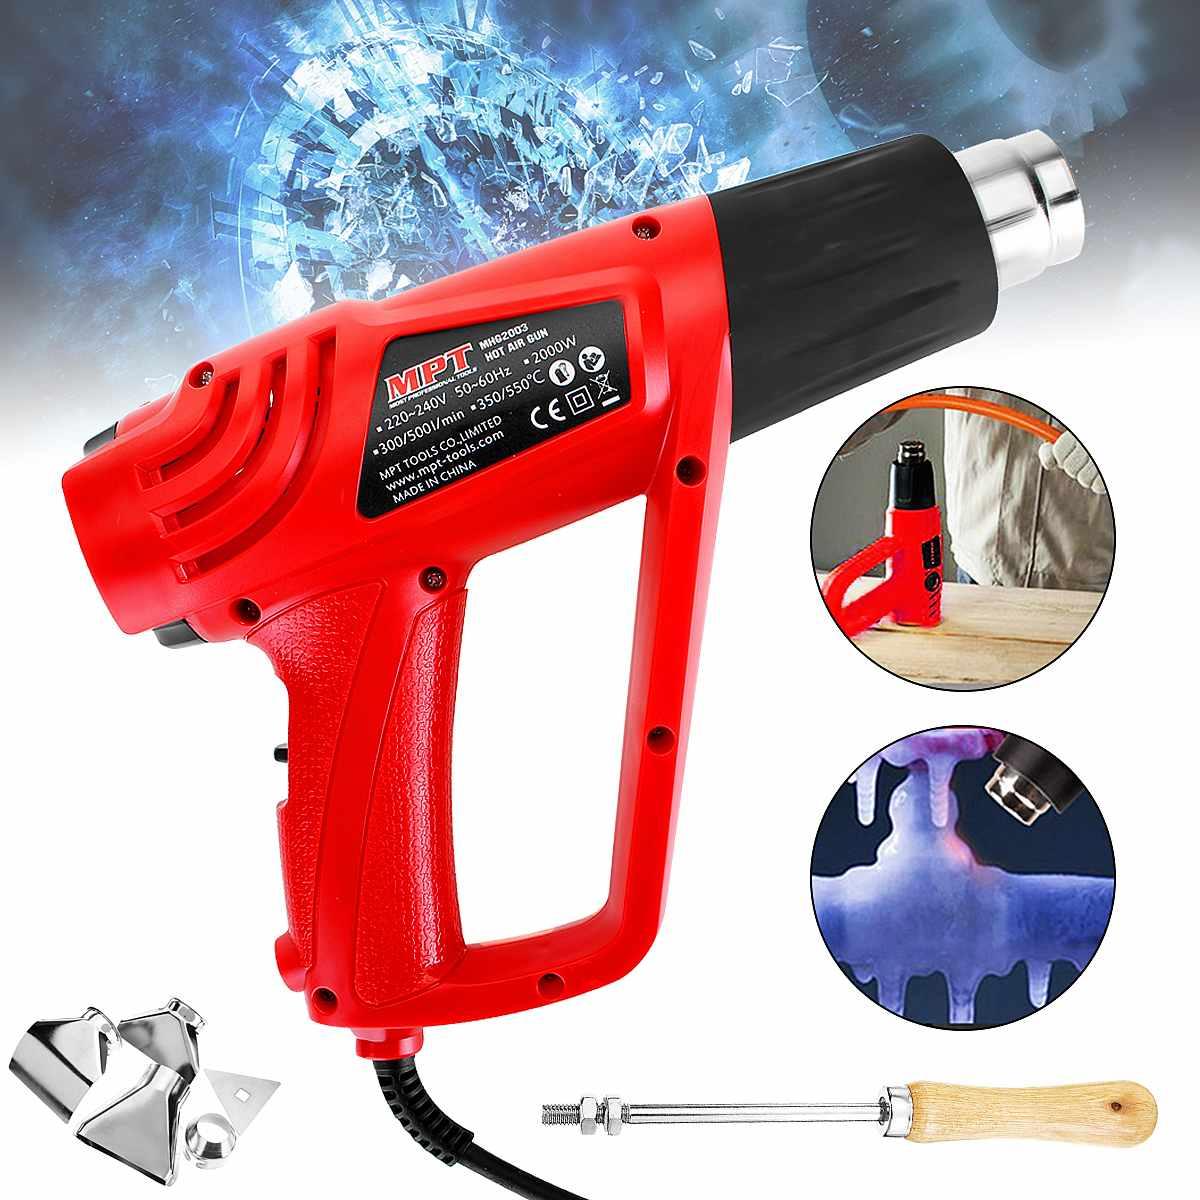 2000W 220V EU Heat Guns Hot Air Guns Solder Hair Dryer Temperature-controlled Building Hot Air Soldering Hair Dryer